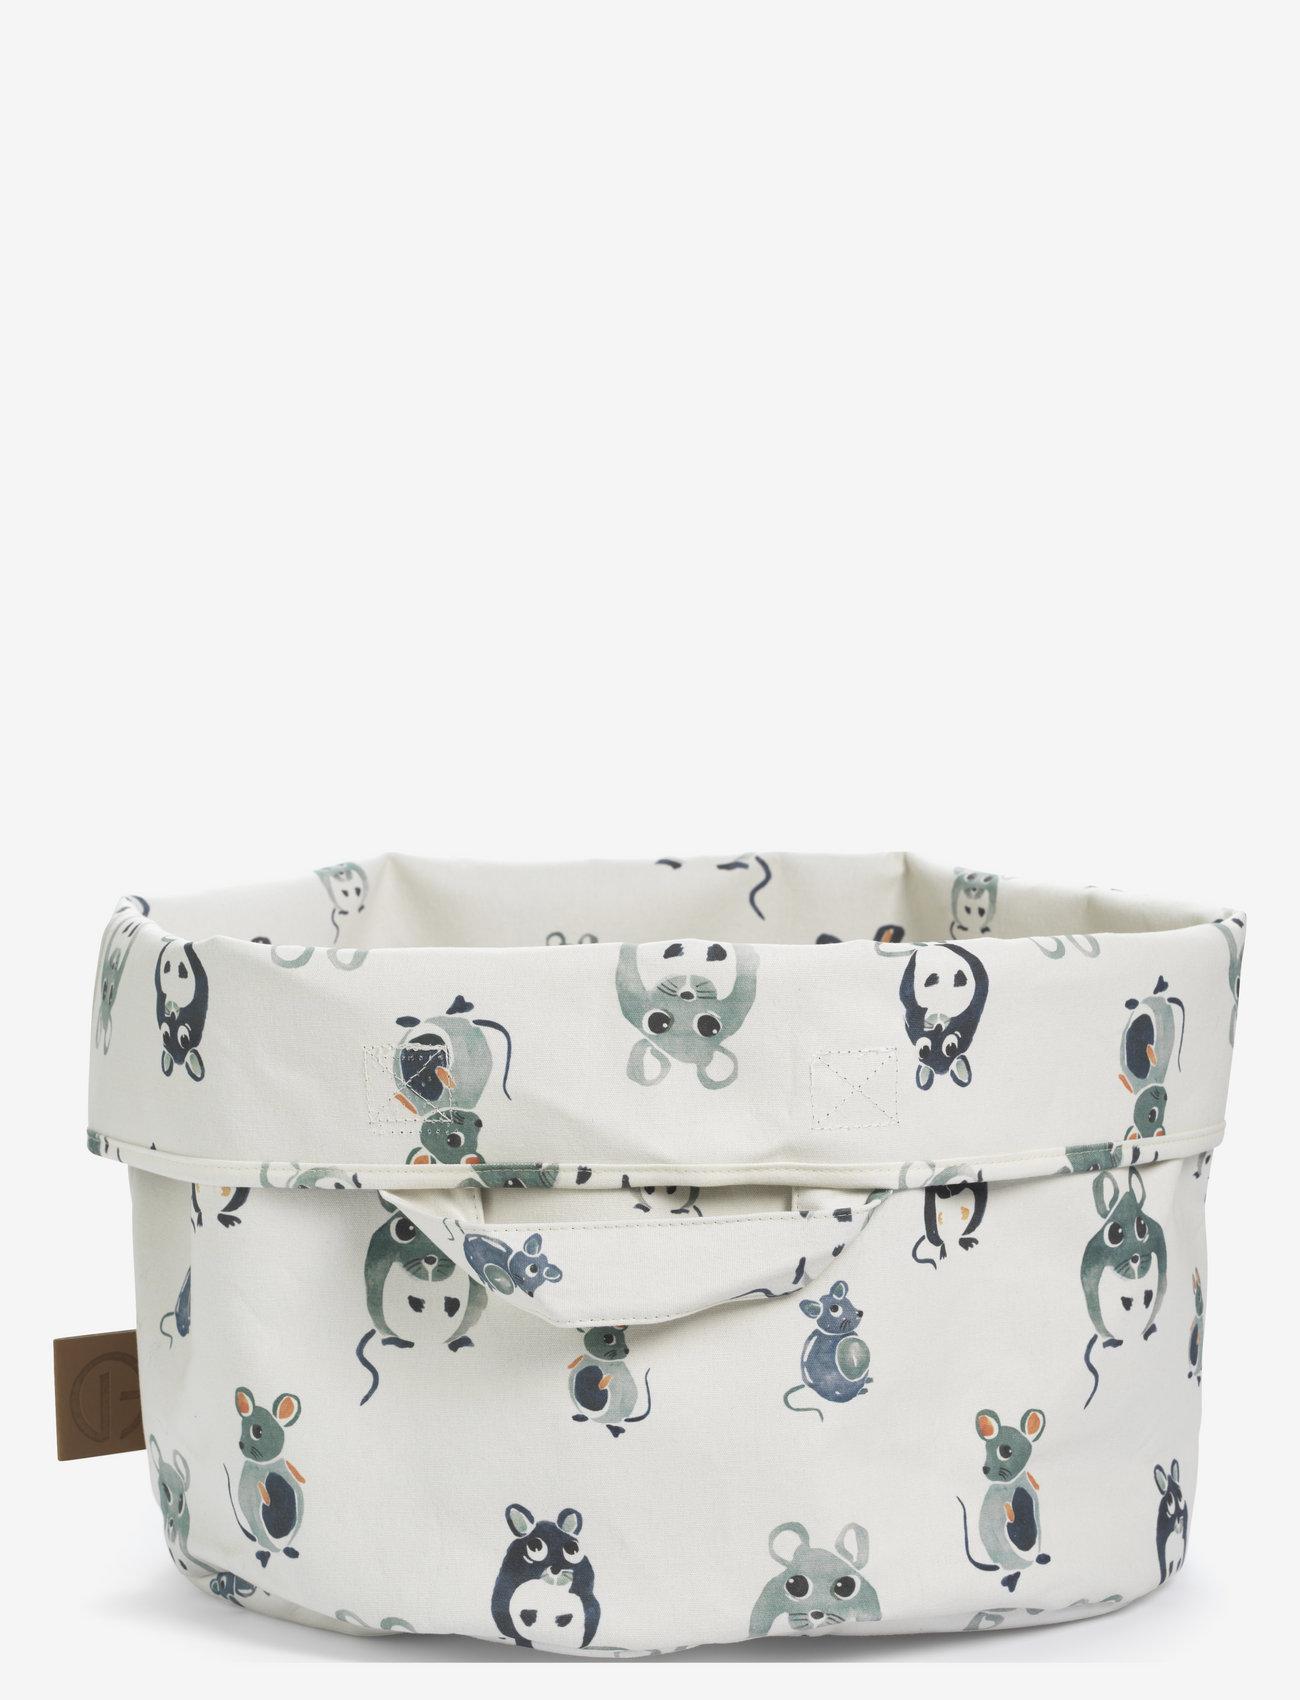 Elodie Details - StoreMyStuff - Forest Mouse - przechowywanie - white/mint/dusty blue - 1